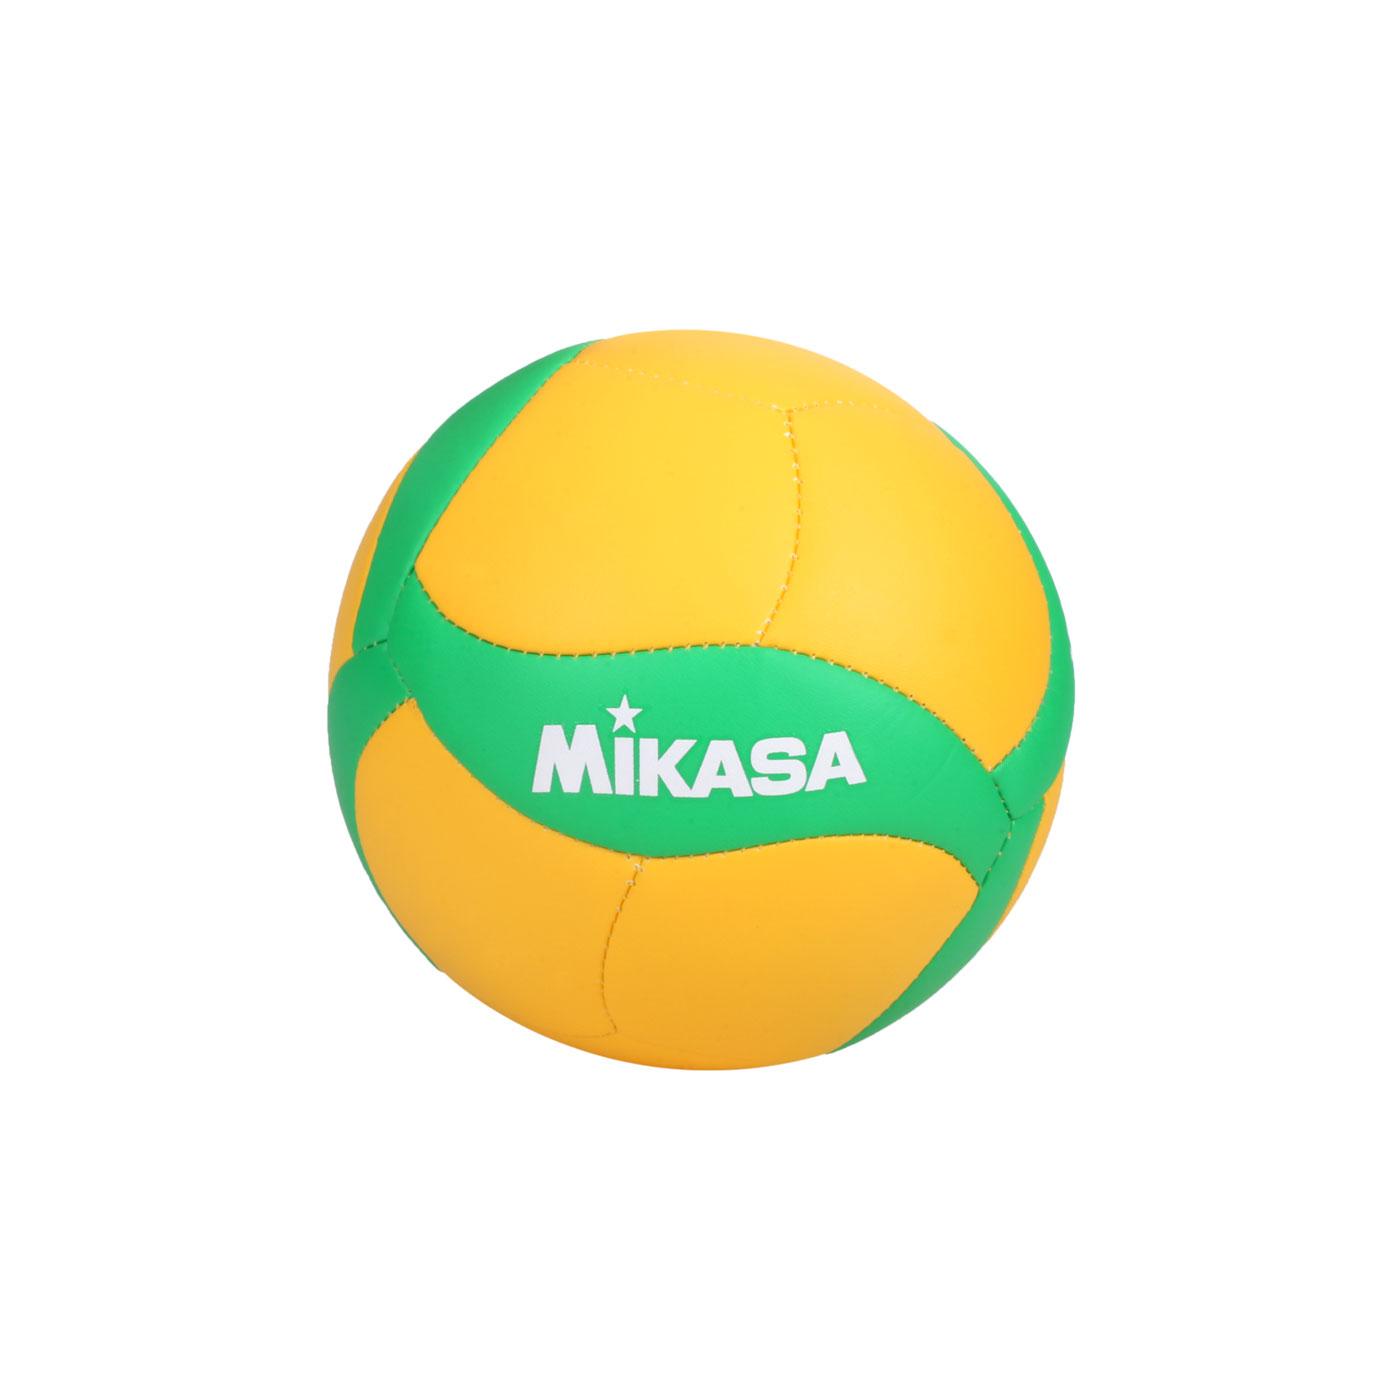 MIKASA 歐冠杯紀念排球#1.5 MKV15W-CEV - 黃綠白